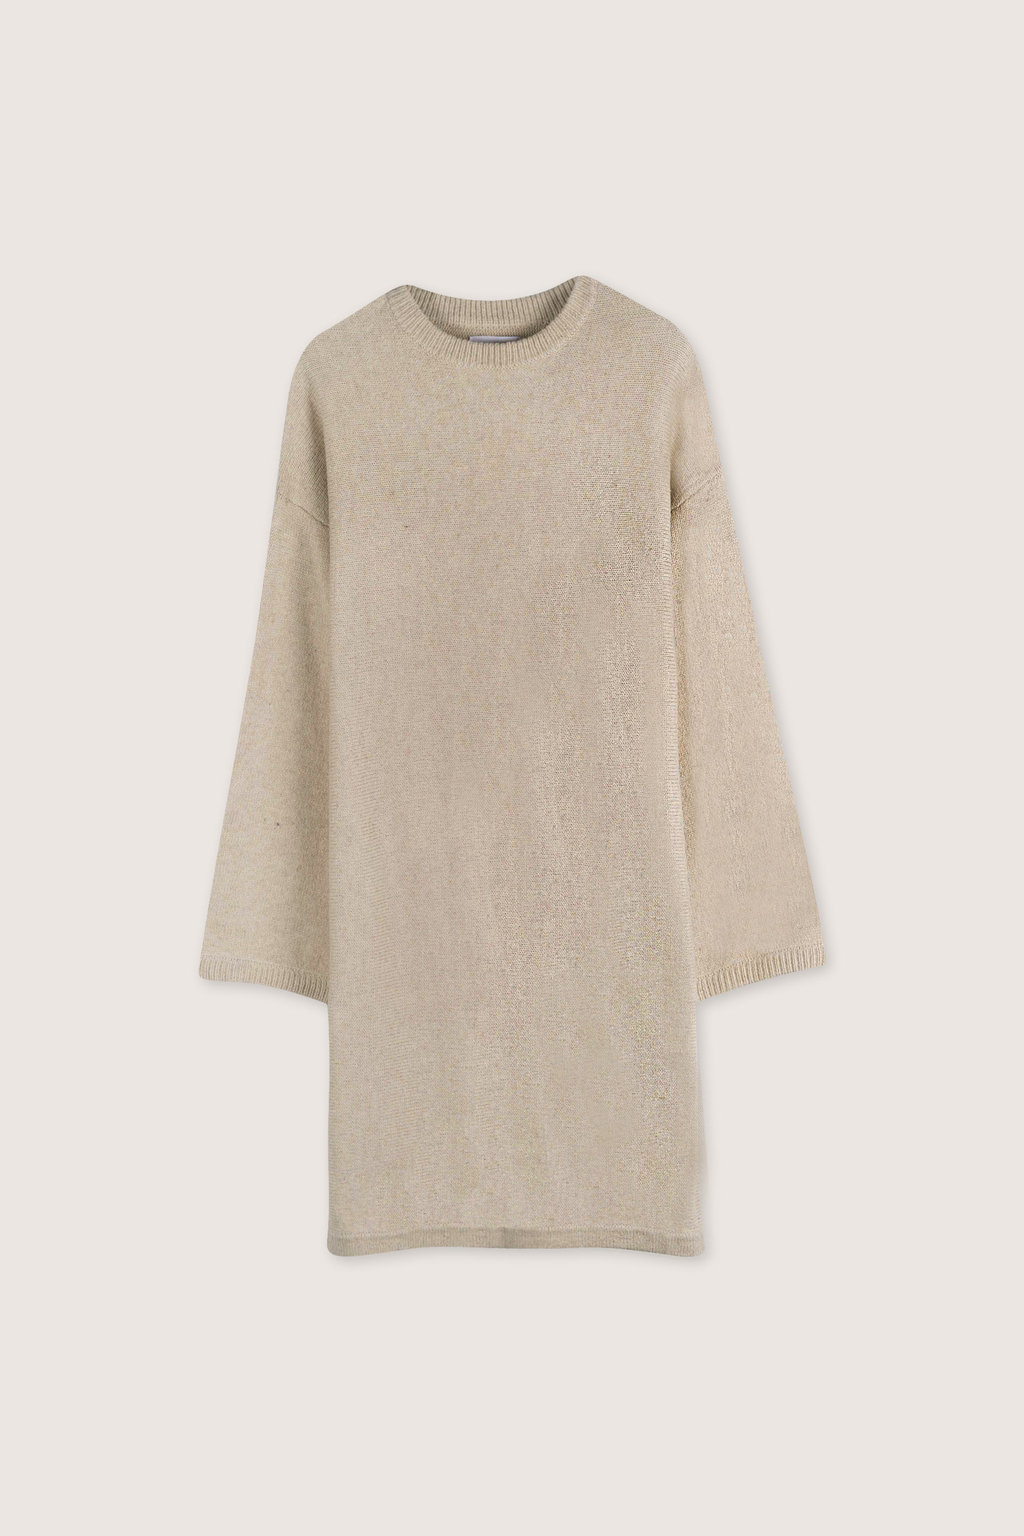 Dress 1817 Oatmeal 7